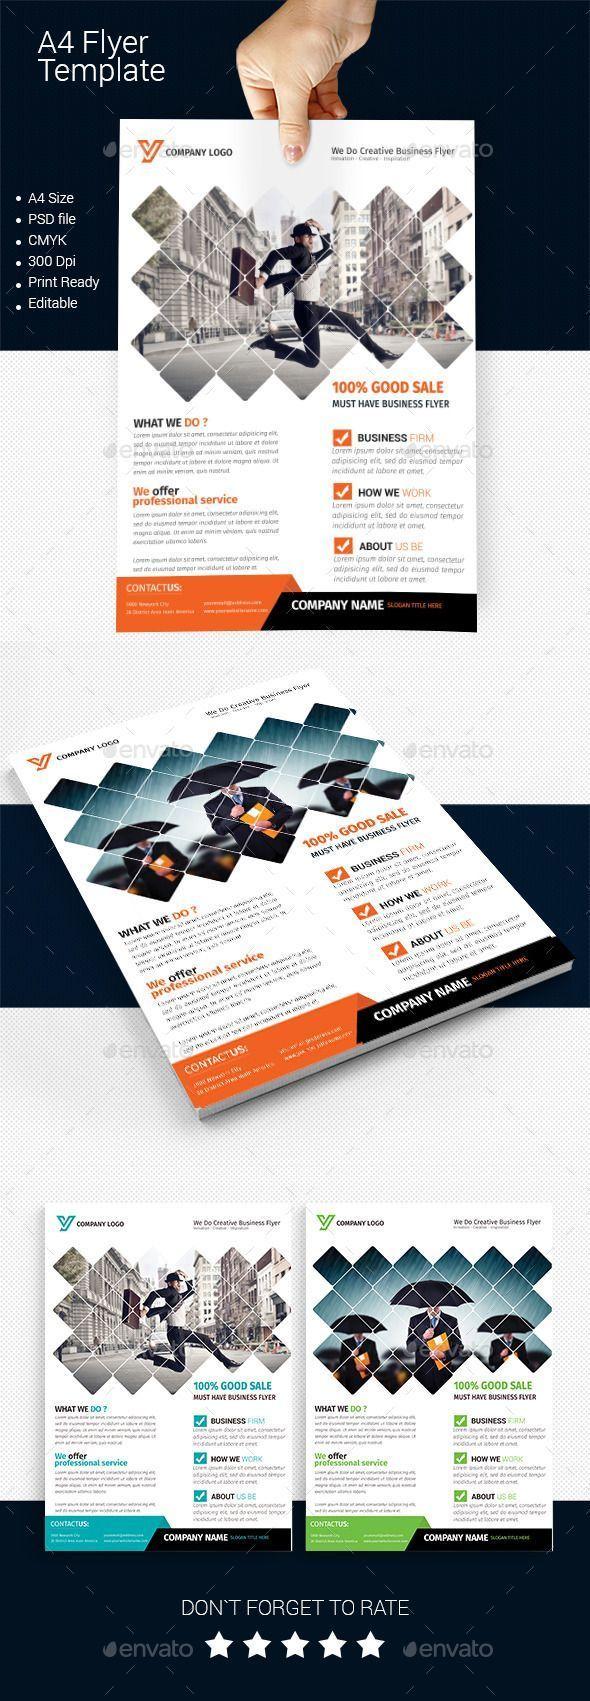 A4 Business Flyer Template 01 – Folletos corporativos – Tarjetas de visita – #BUSINESS …   – ideas de diseño